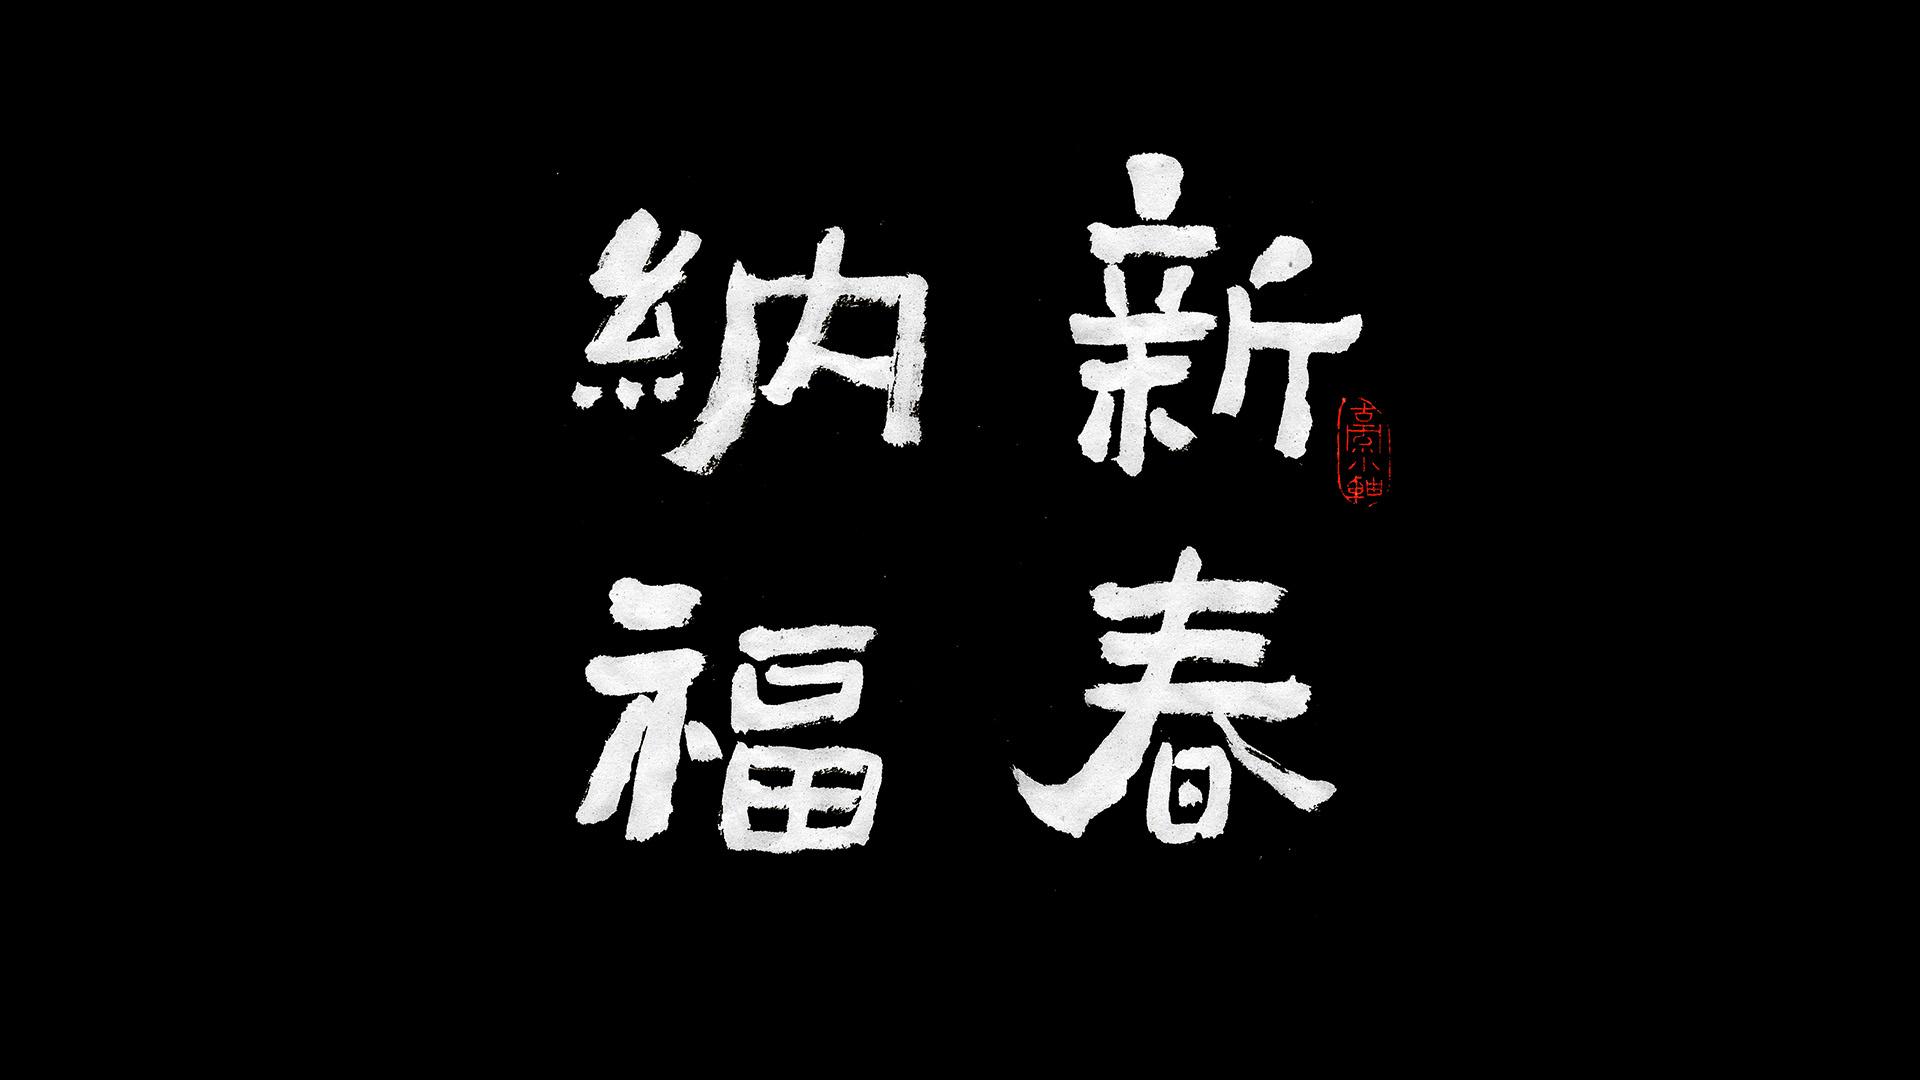 Av85 happy new year chinese letter calligraphy illustration art dark 1920 x 1080 thecheapjerseys Gallery